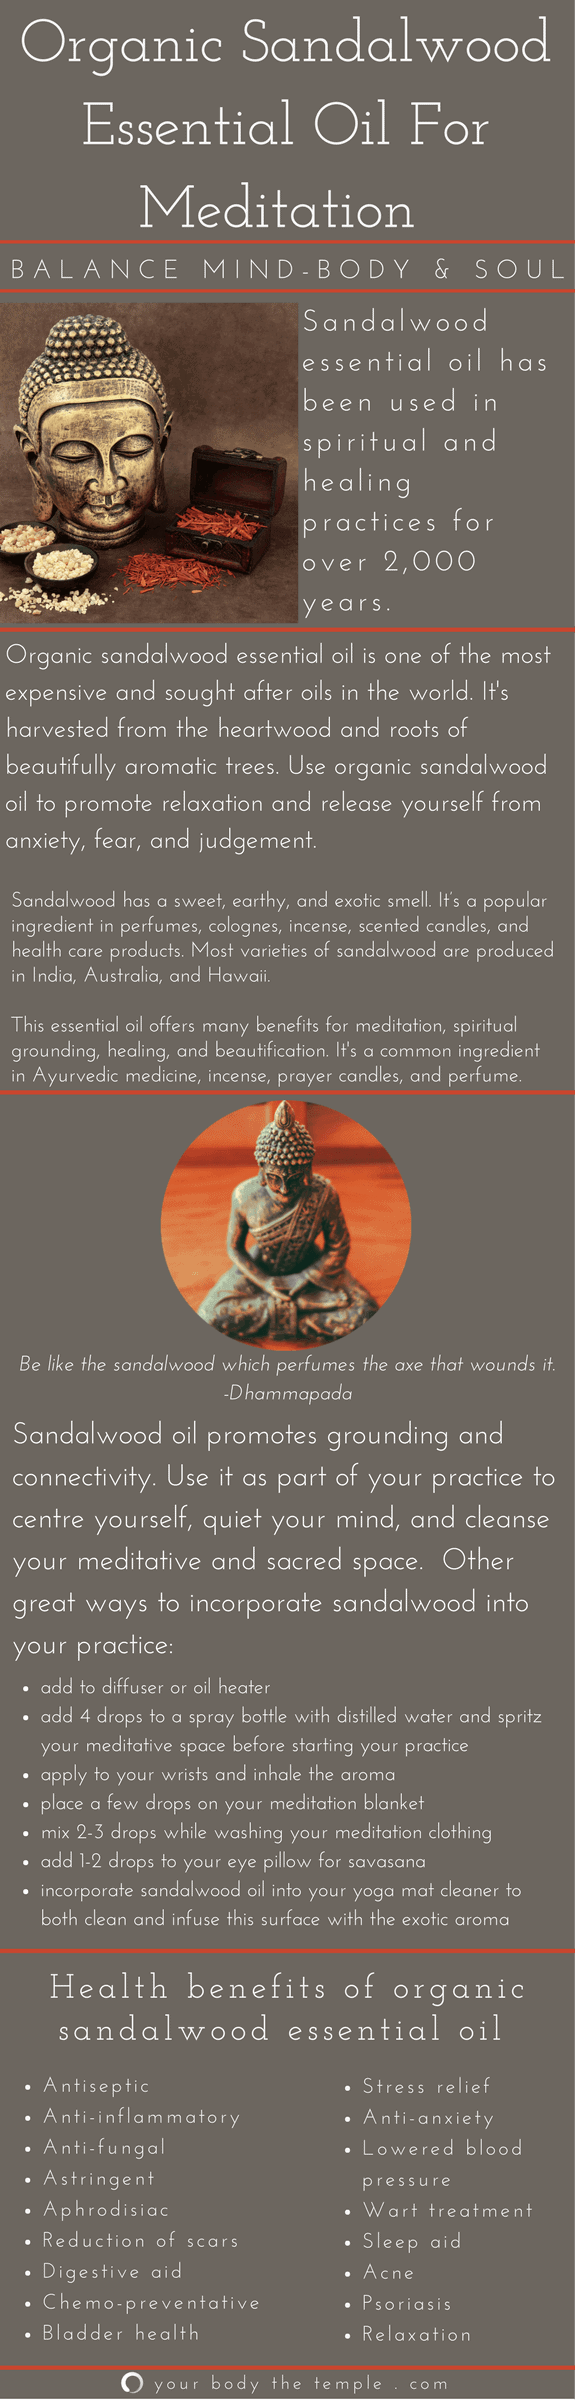 Organic Sandalwood Essential Oil For Meditation And Health